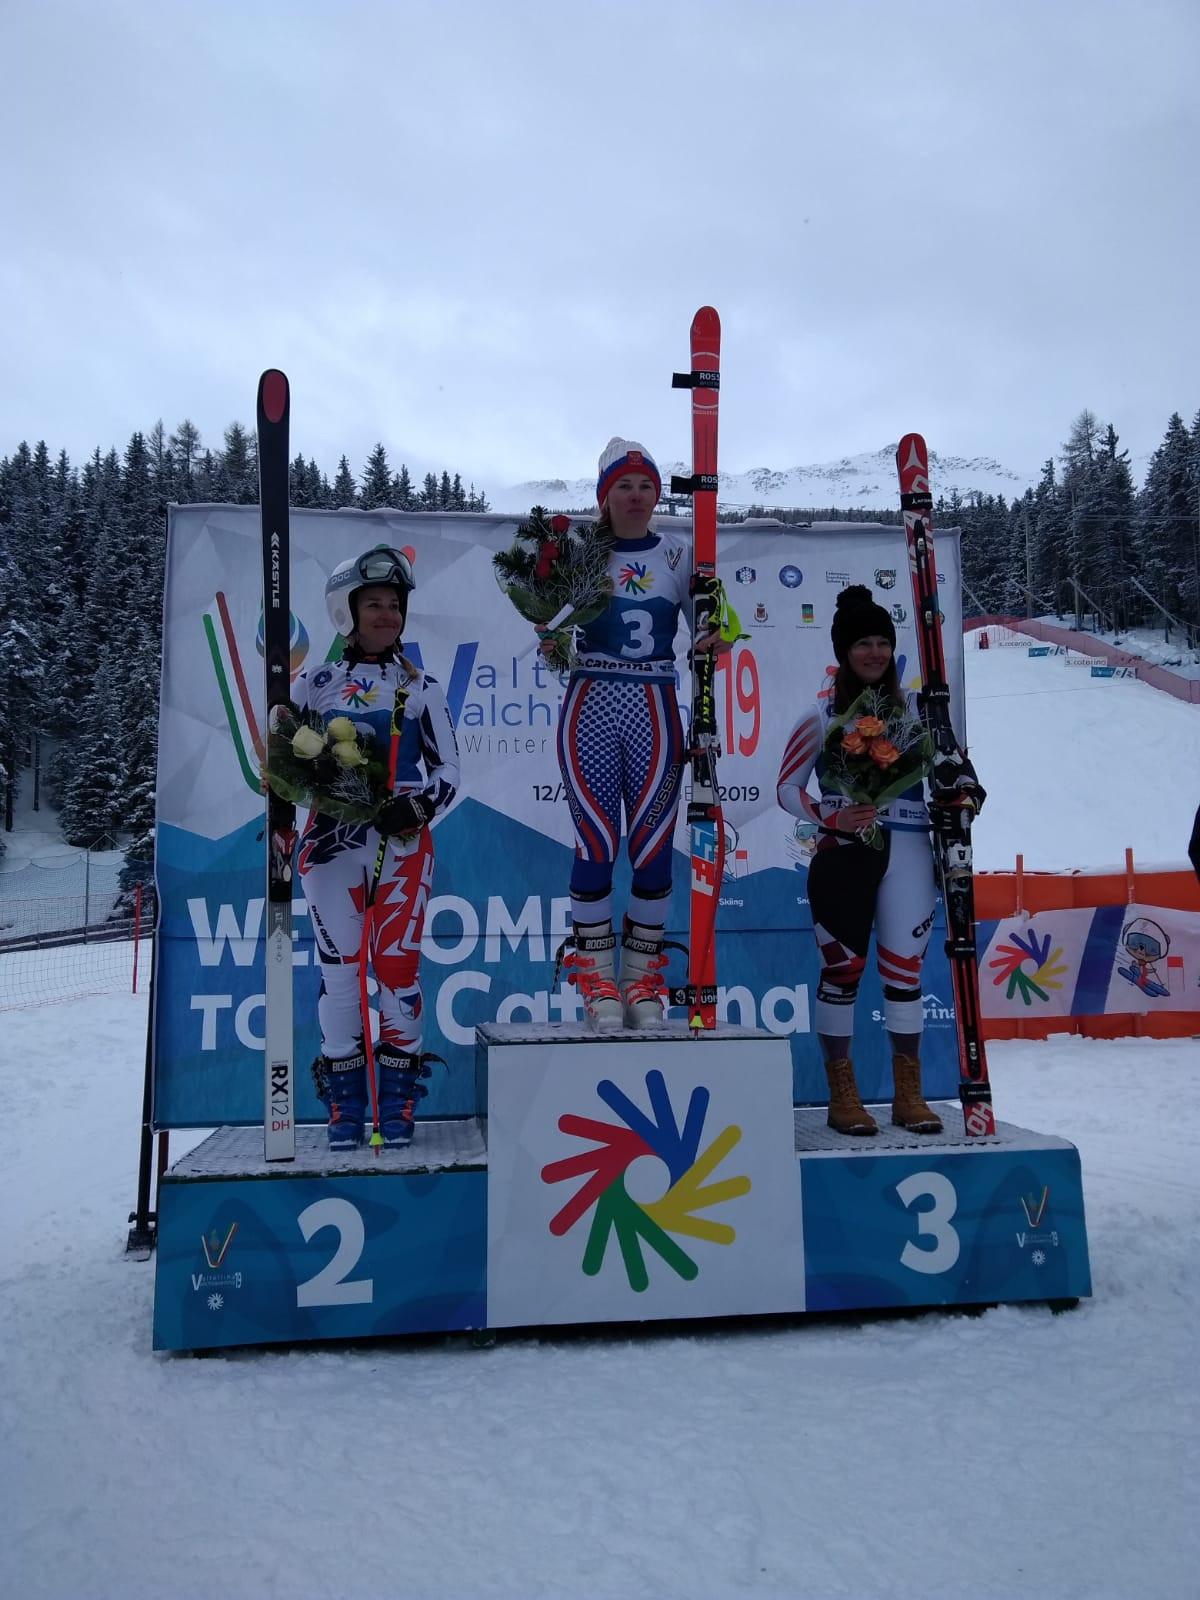 Russia's Elena Yakovishina topped the women's downhill podium ©Deaflympics 2019